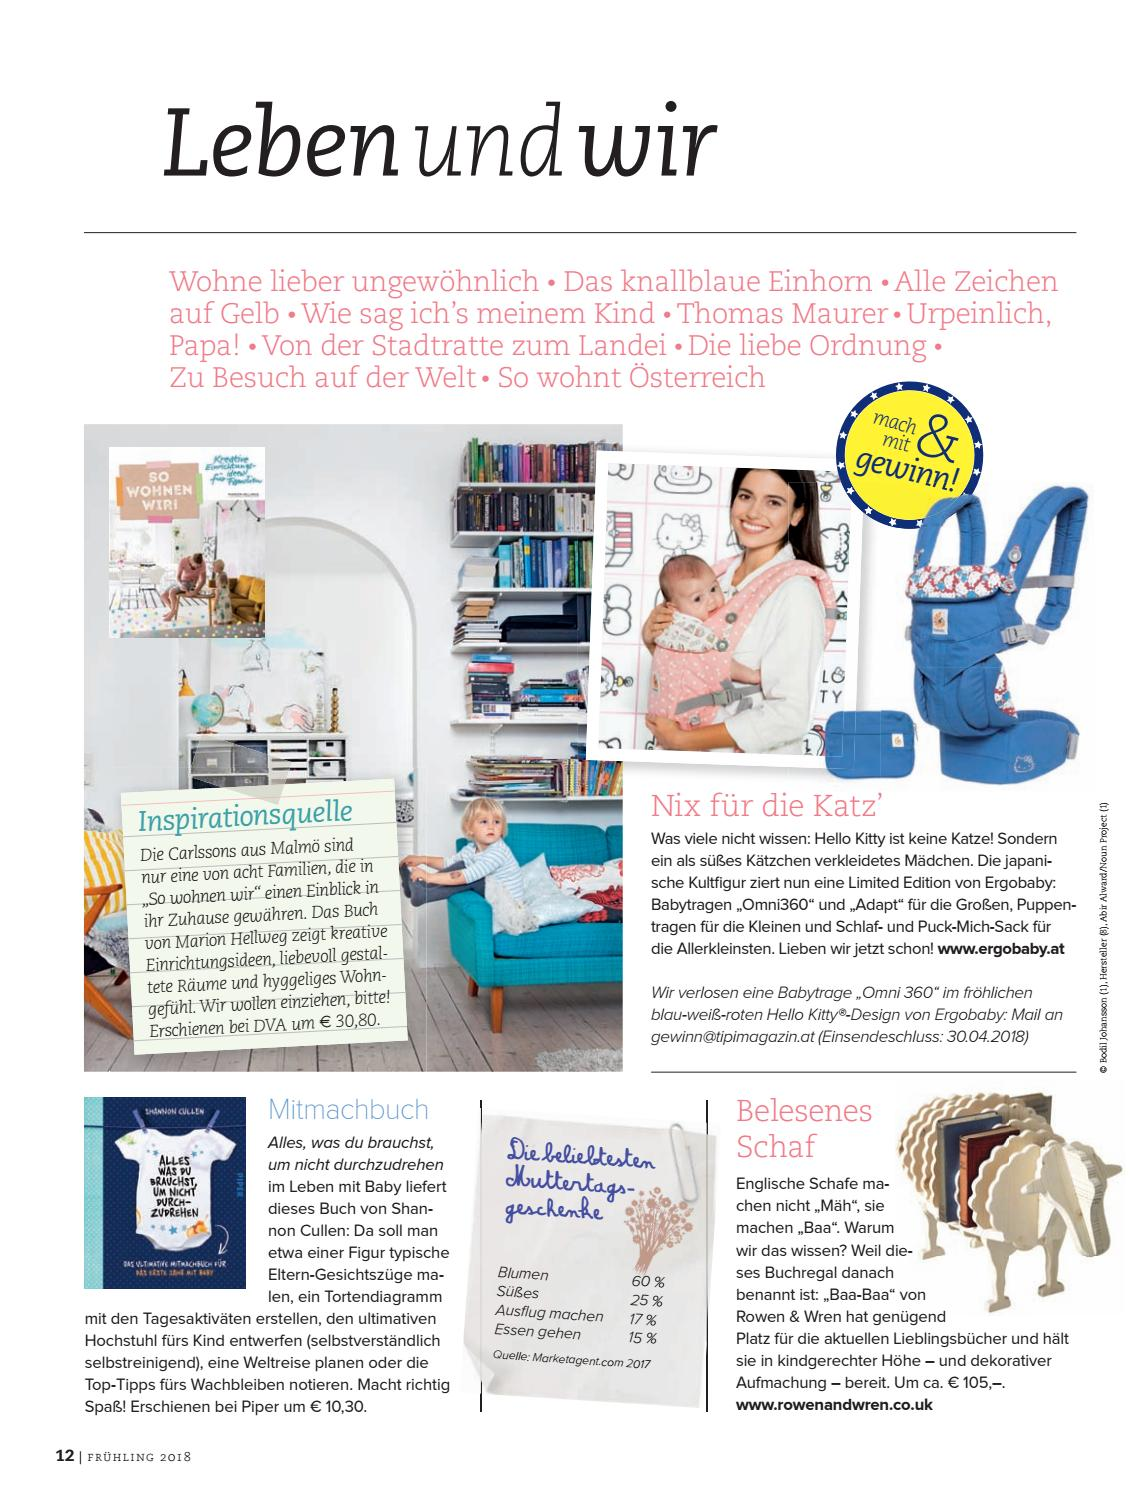 Tipi Magazin Für Die Familie Frühling2018 By Pph Media Verlag